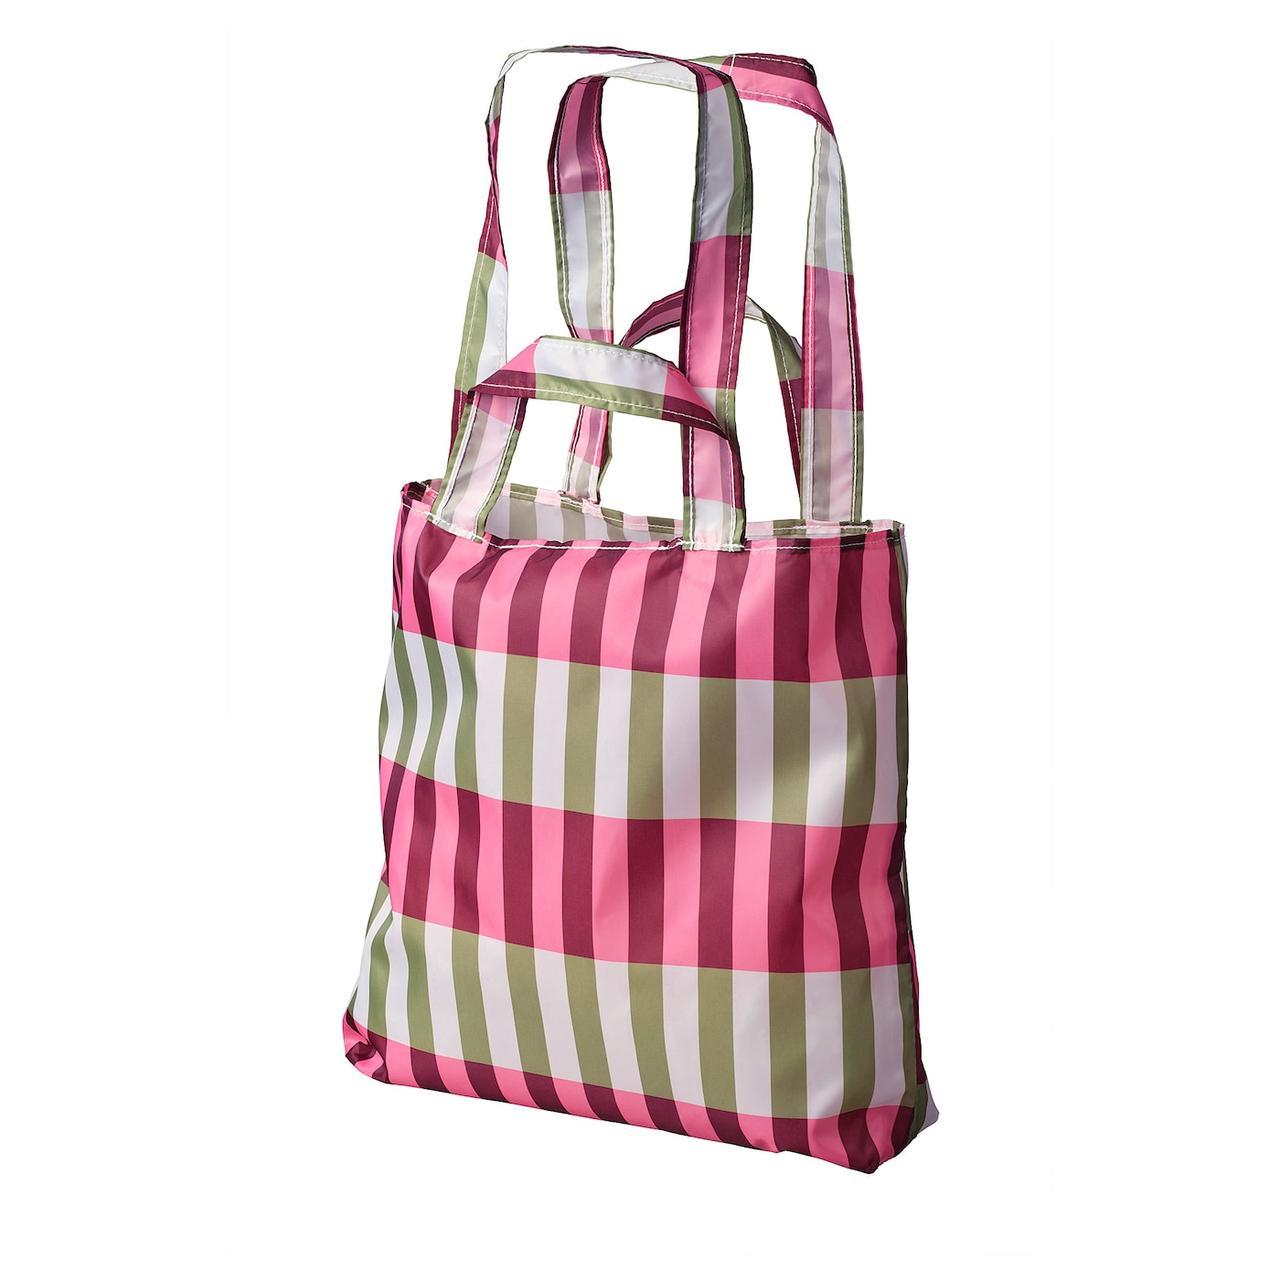 IKEA SKYNKE (304.413.61) Господарська сумка